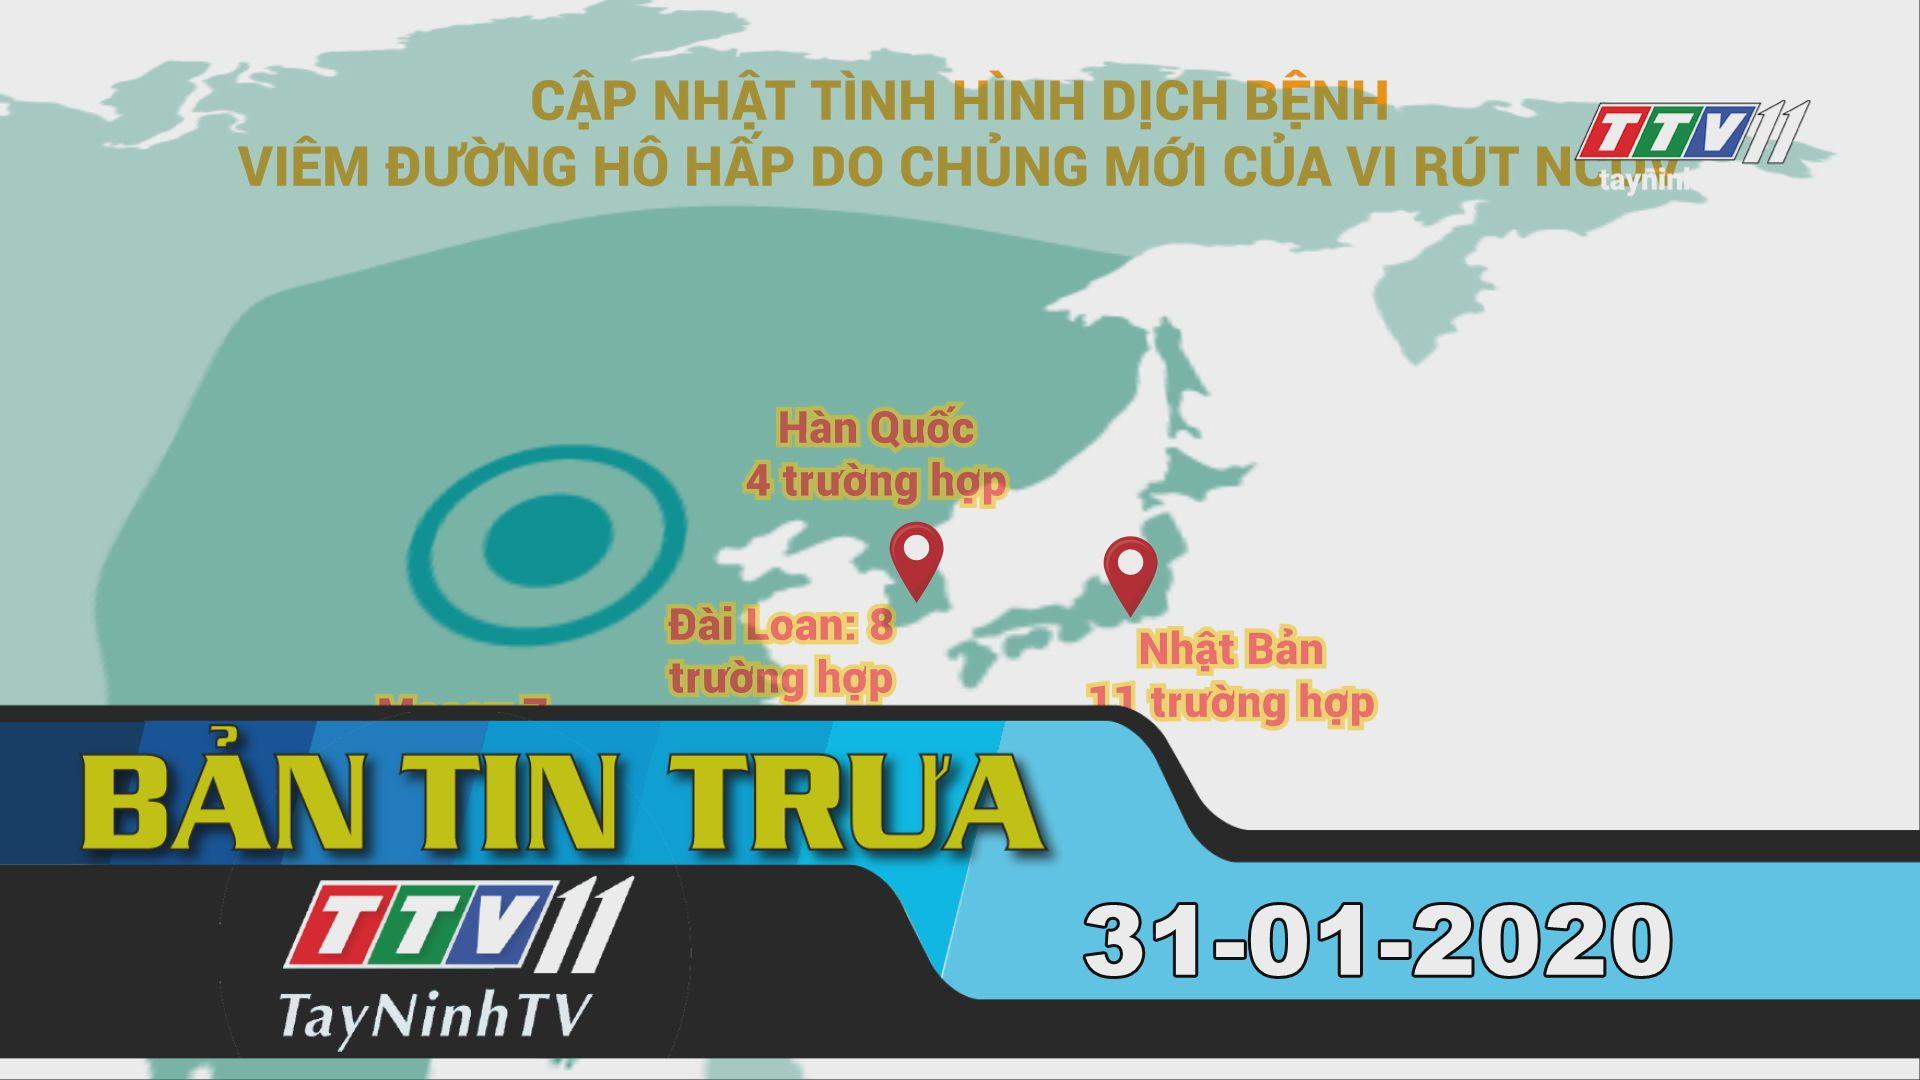 Bản tin trưa 31-2020 | Tin tức hôm nay | TayNinhTV